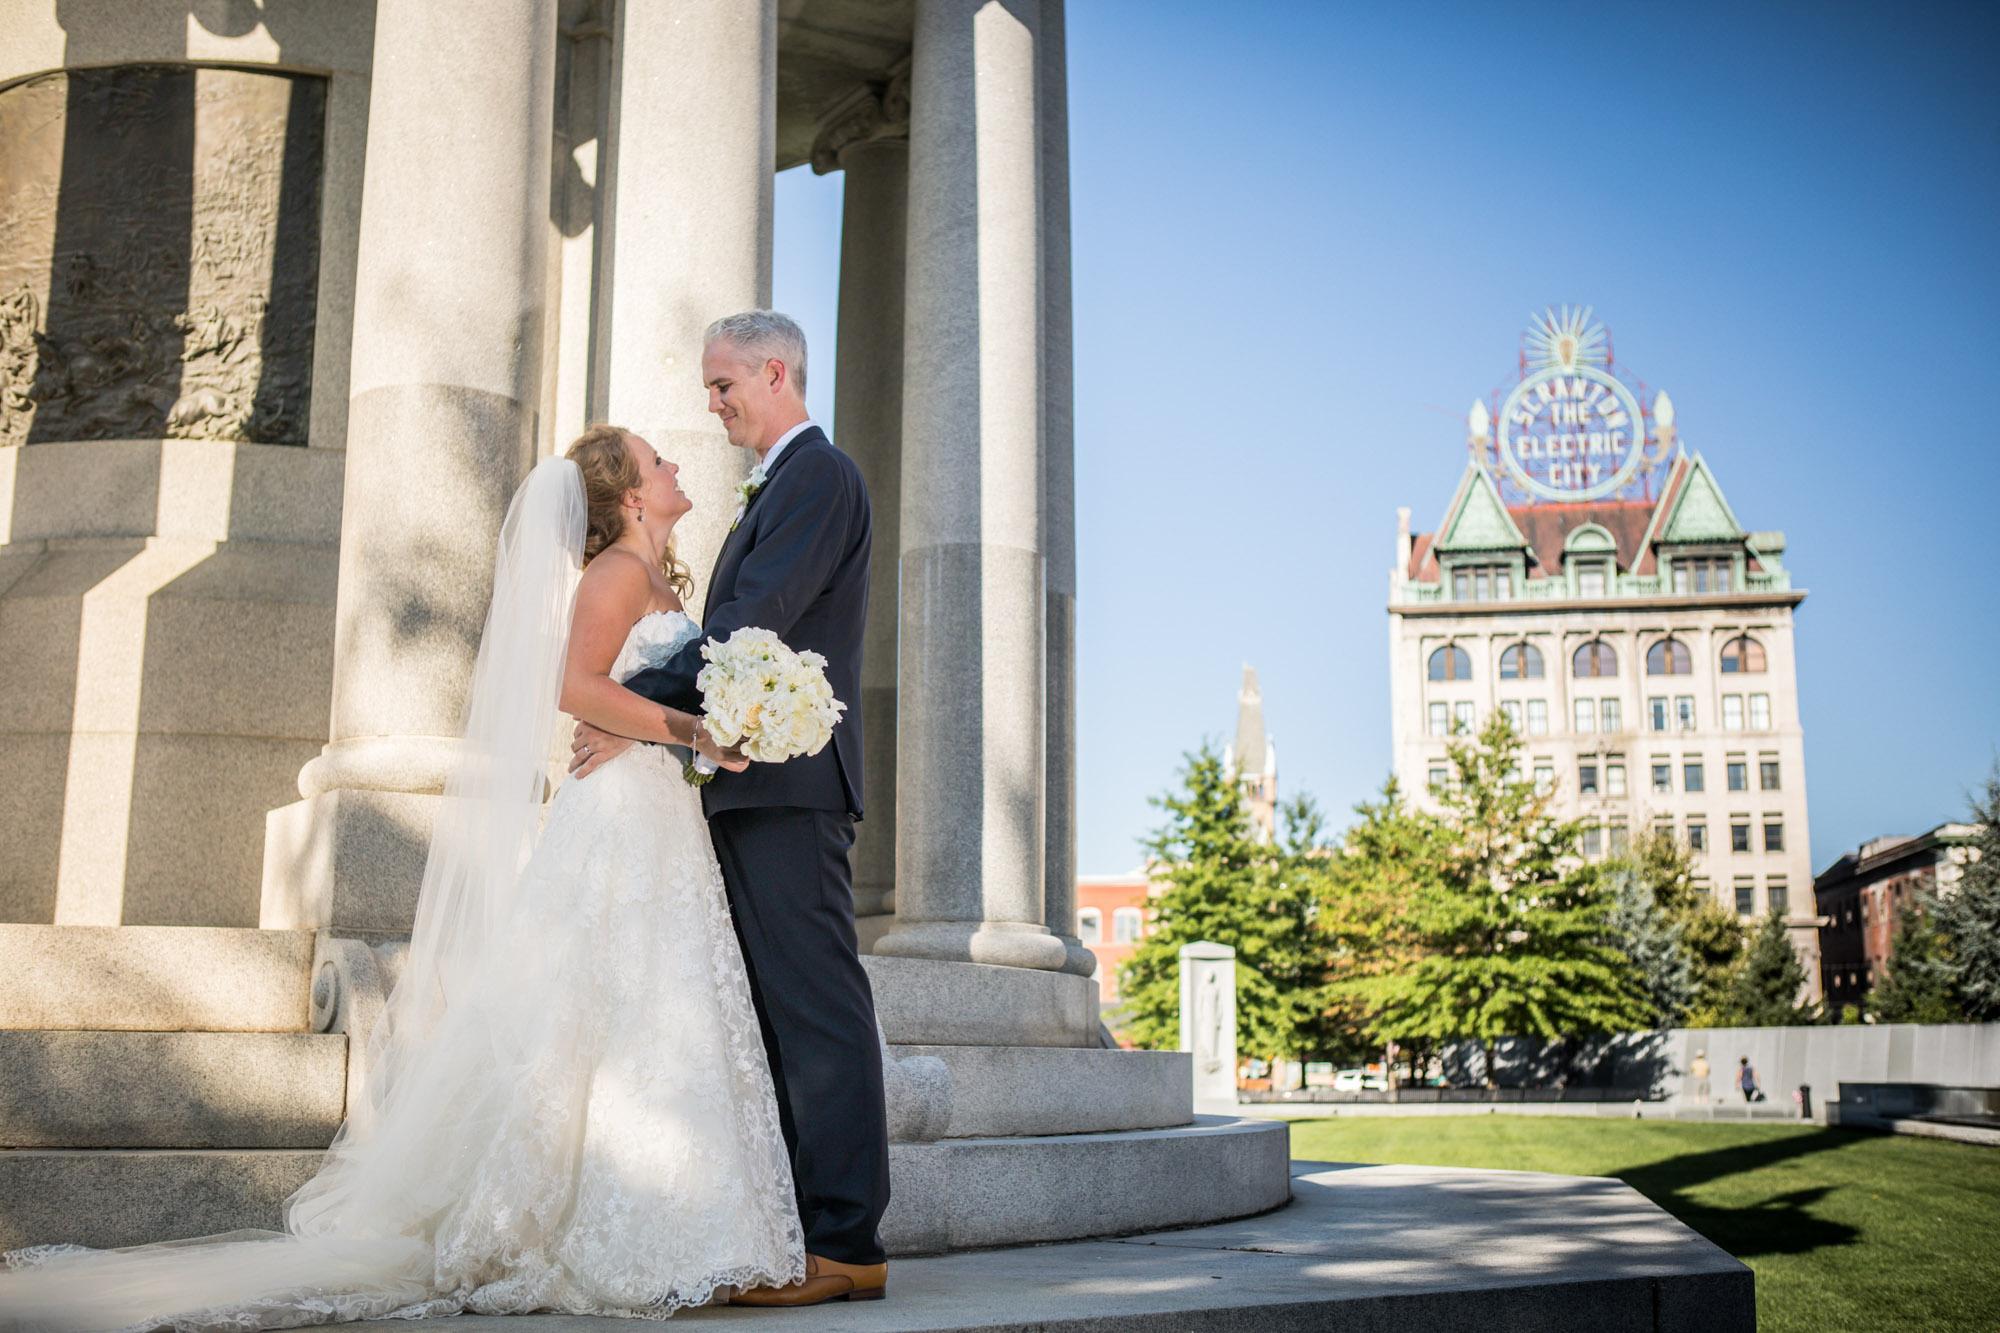 scranton_wedding_photographer_lettieri_pa (25 of 47).jpg